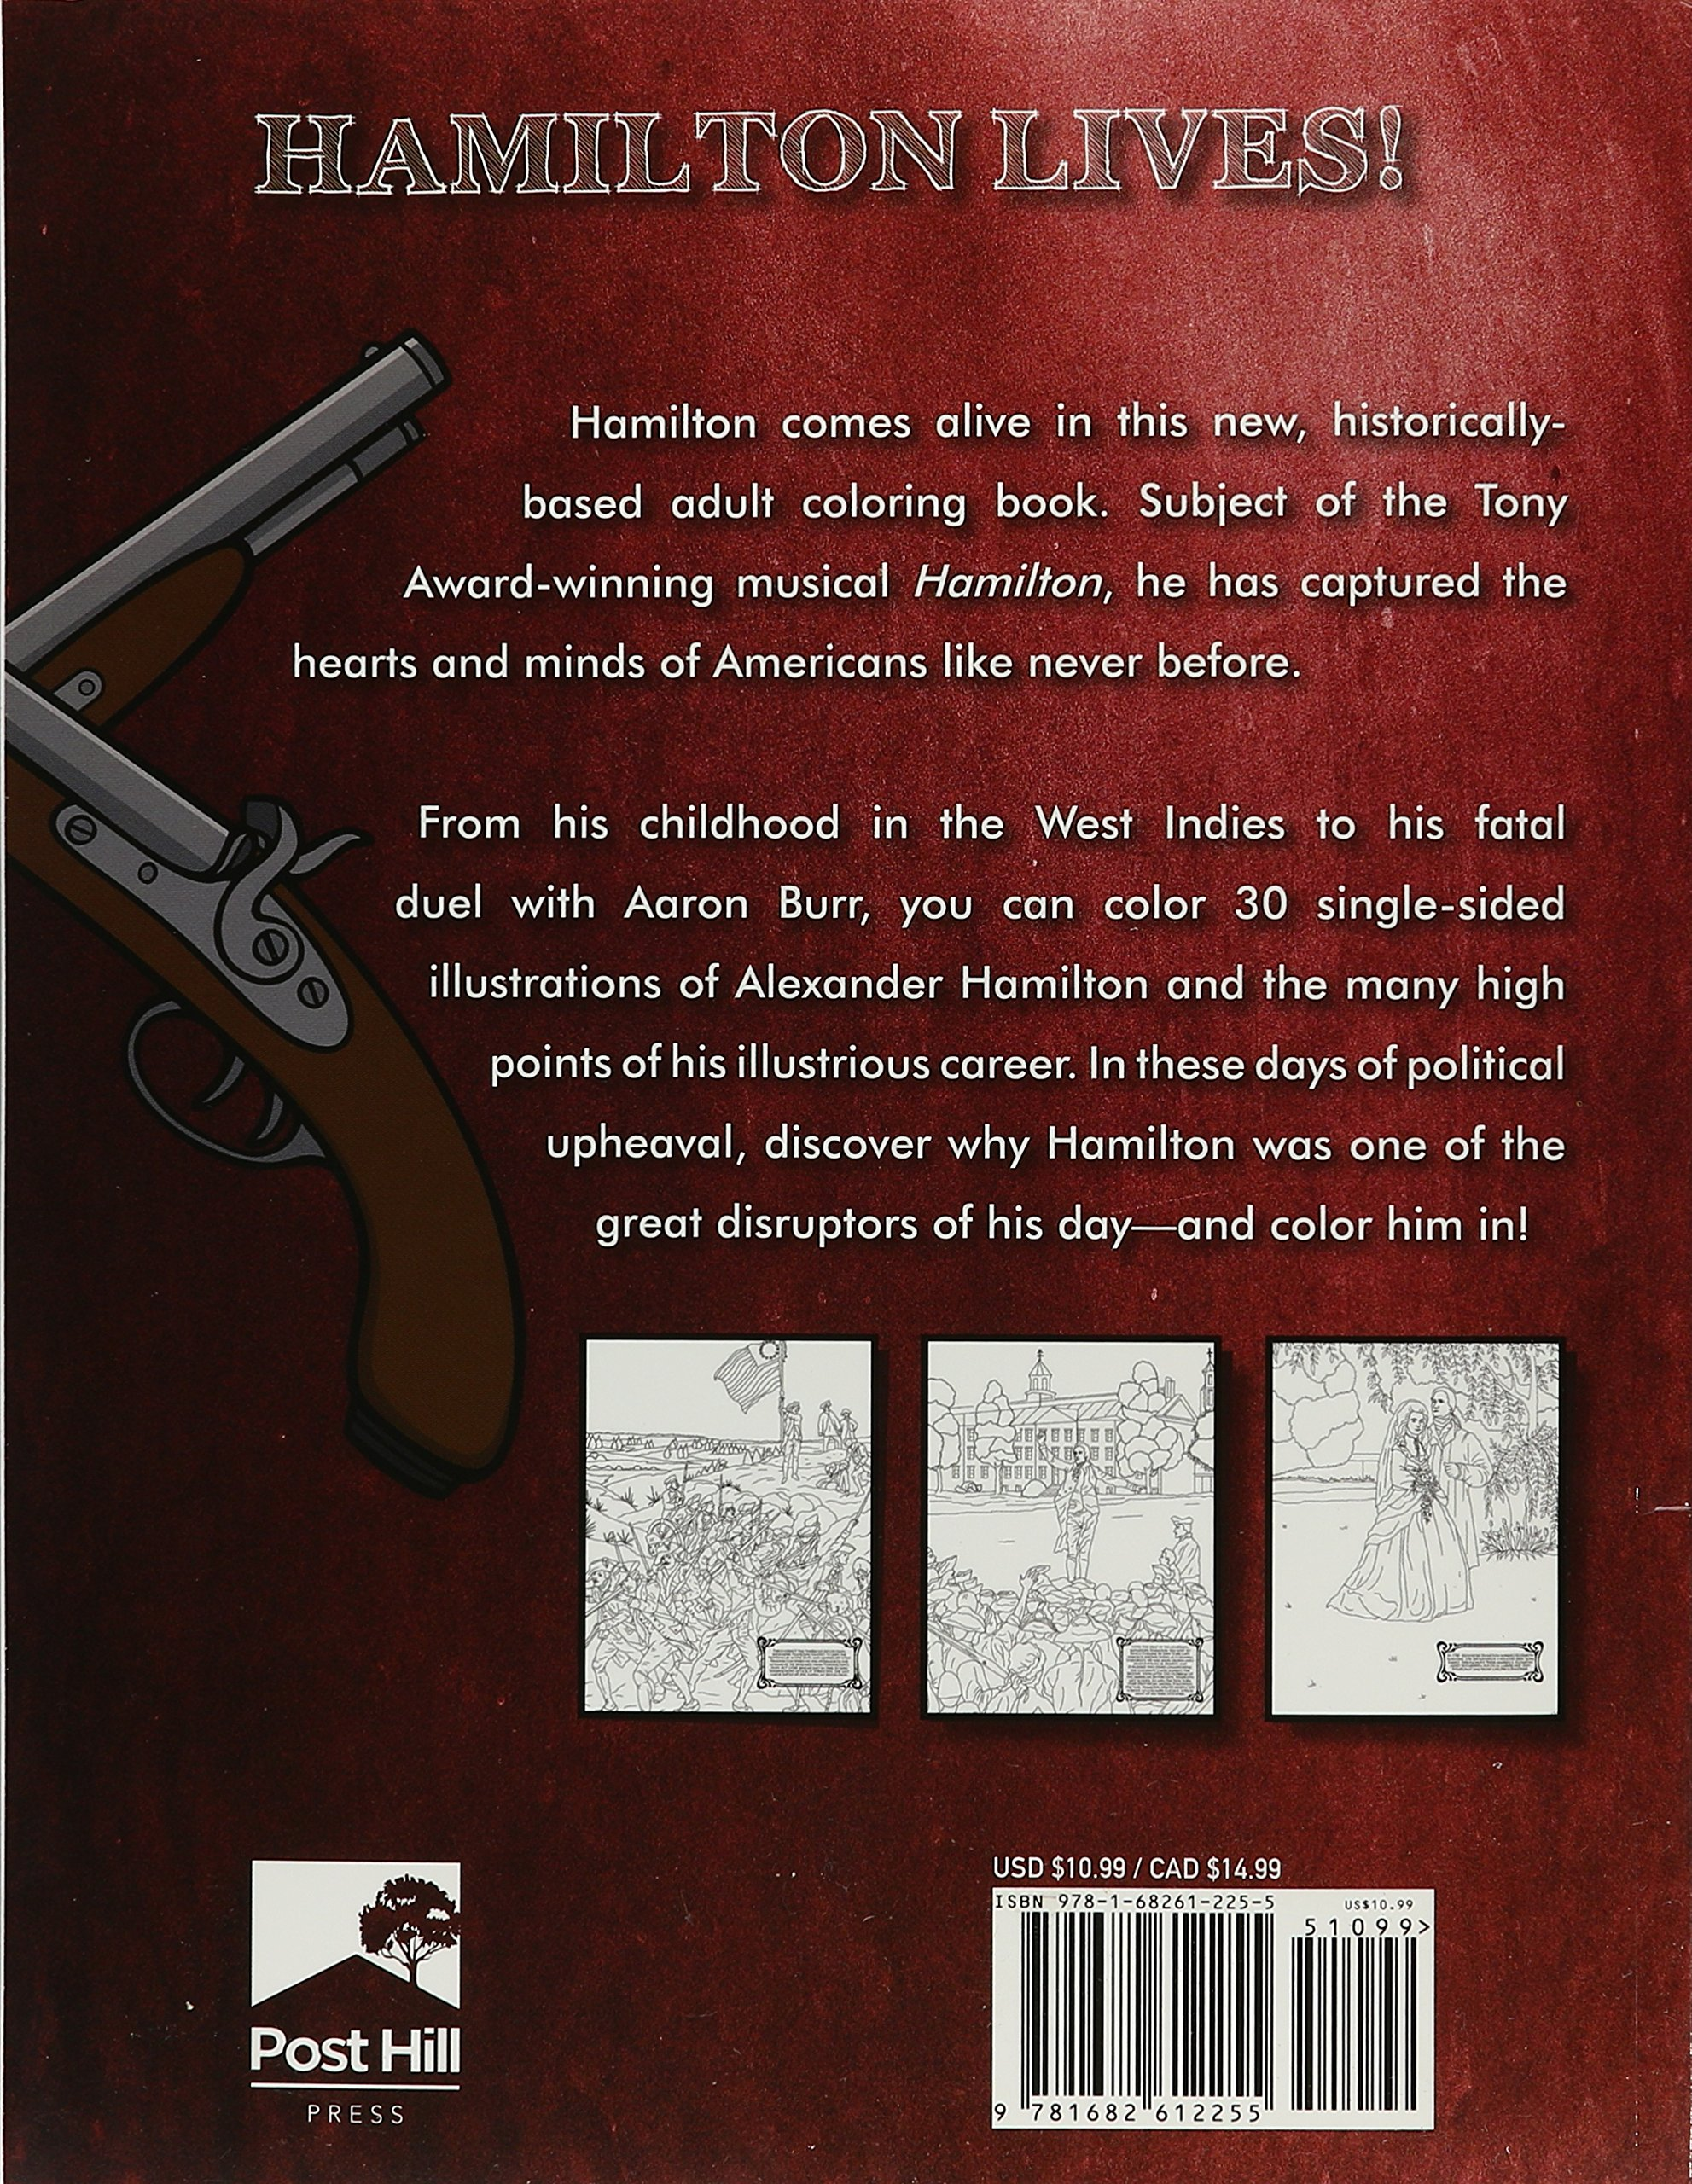 Hamilton: The Adult Coloring Book: M. G. Anthony: 9781682612255:  Amazon.com: Books